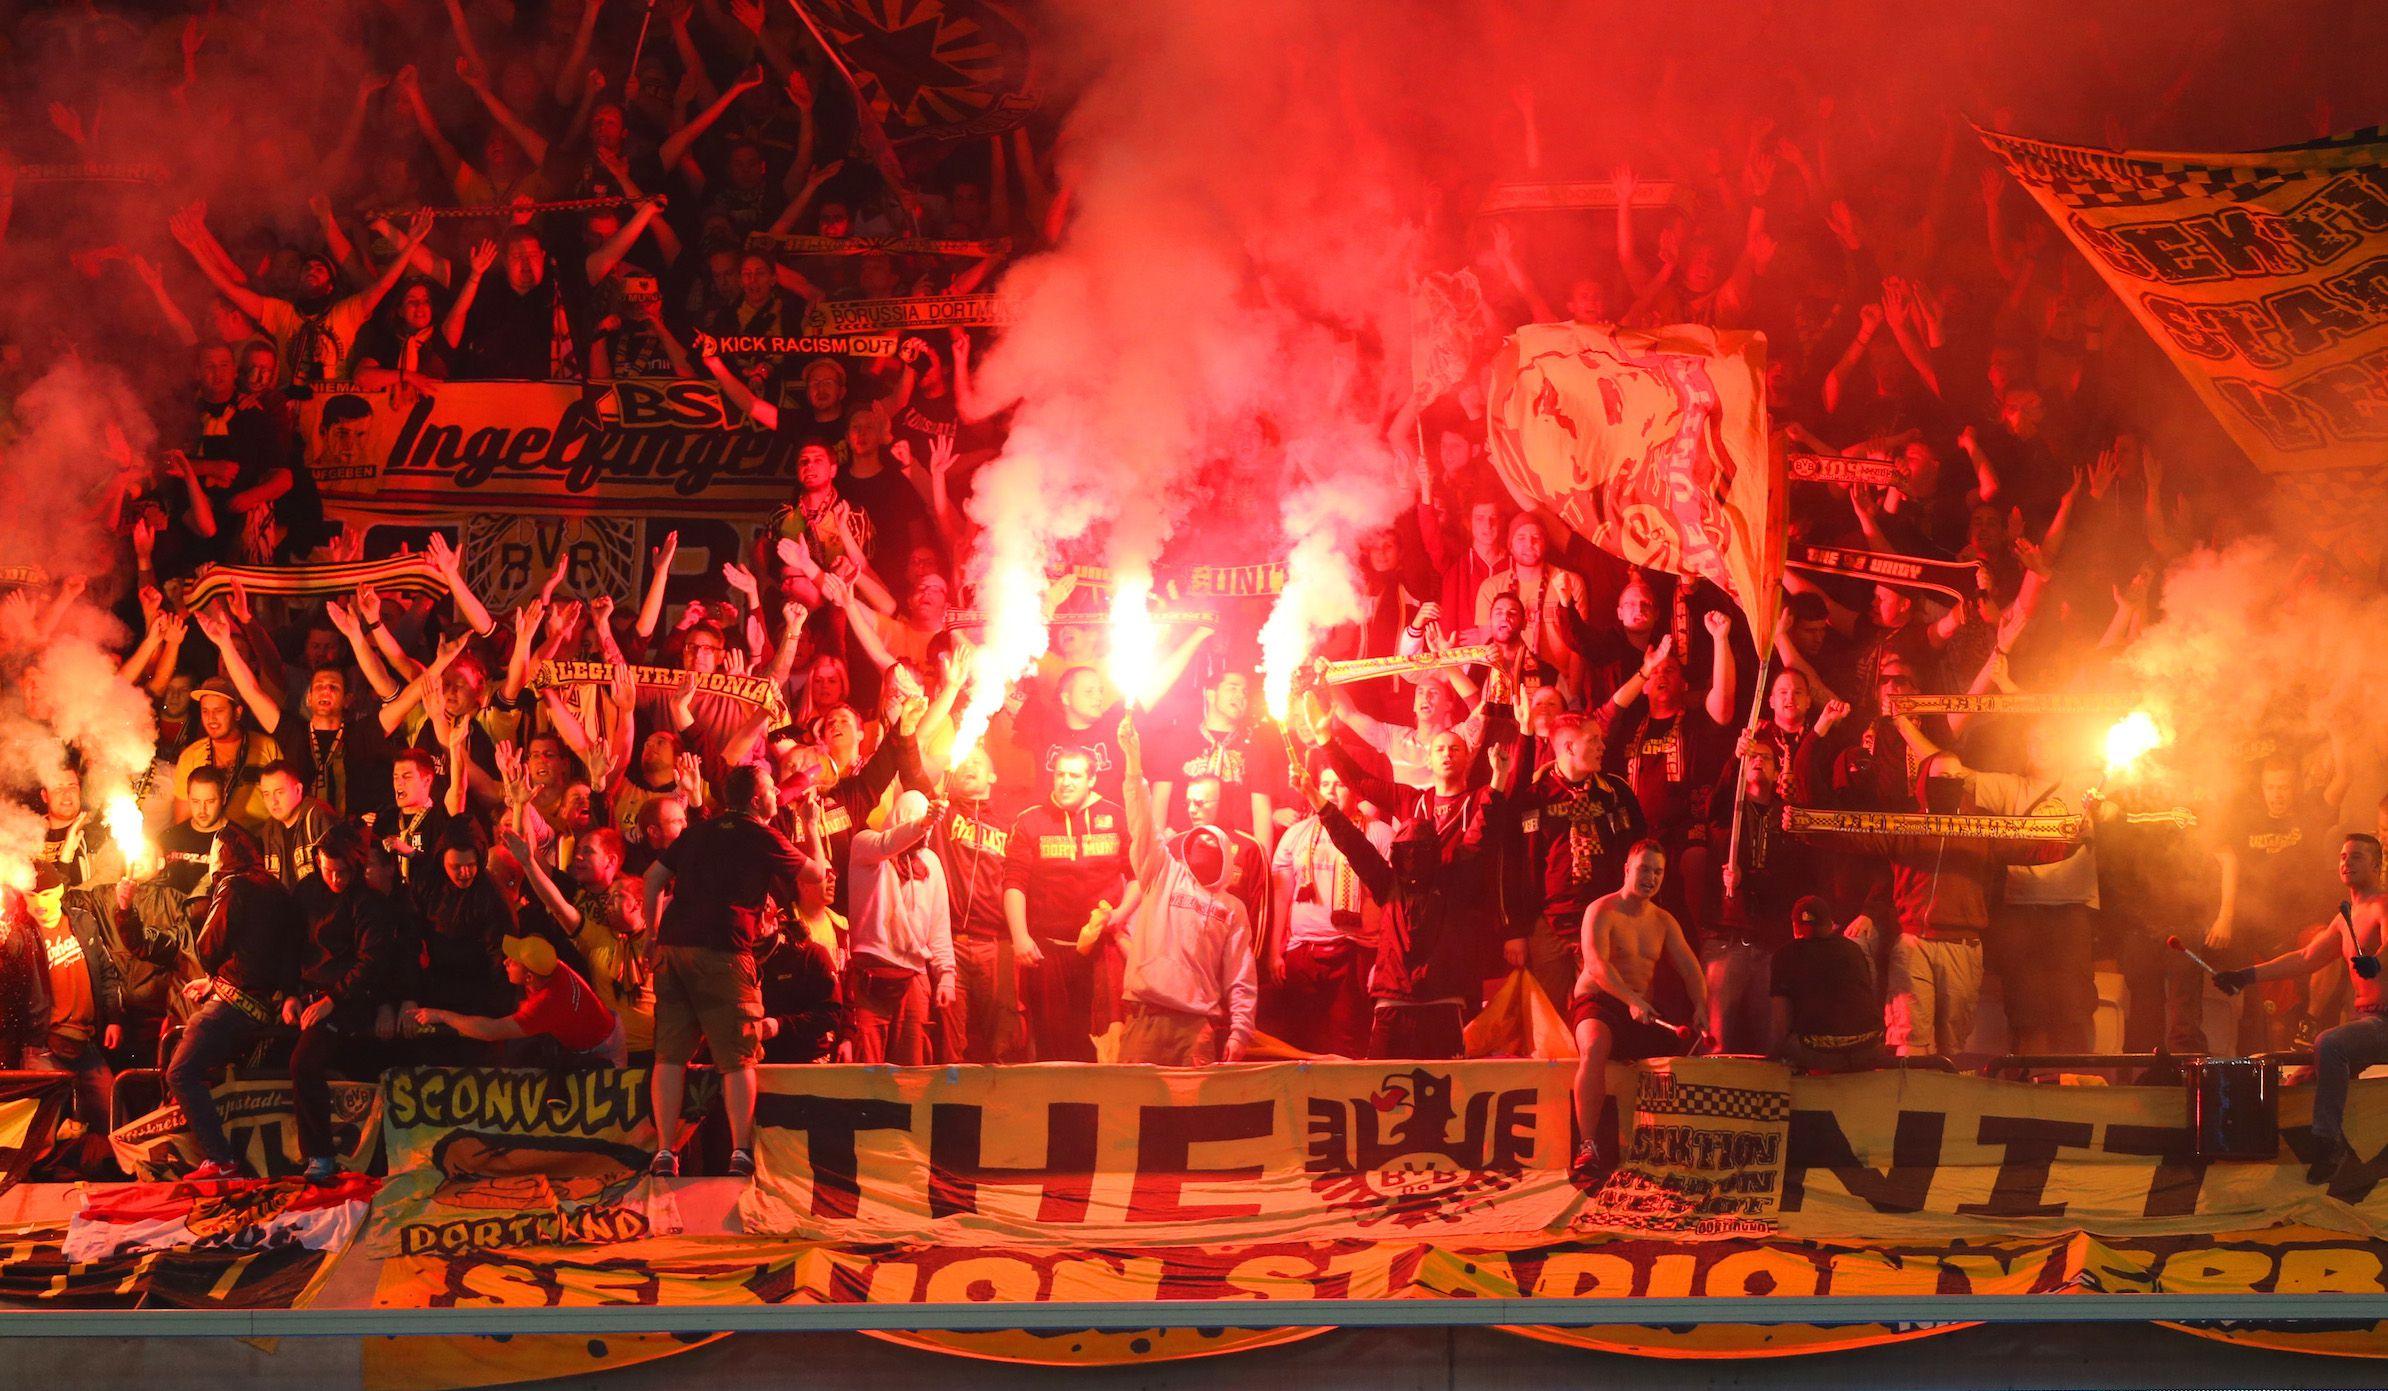 Borussia Dortmund's fans shout during a Champions League garoup D soccer match against Anderlecht at Constant Vanden Stock stadium in Brussels October 1, 2014. REUTERS/Francois Lenoir (BELGIUM - Tags: SPORT SOCCER) - RTR48KAU